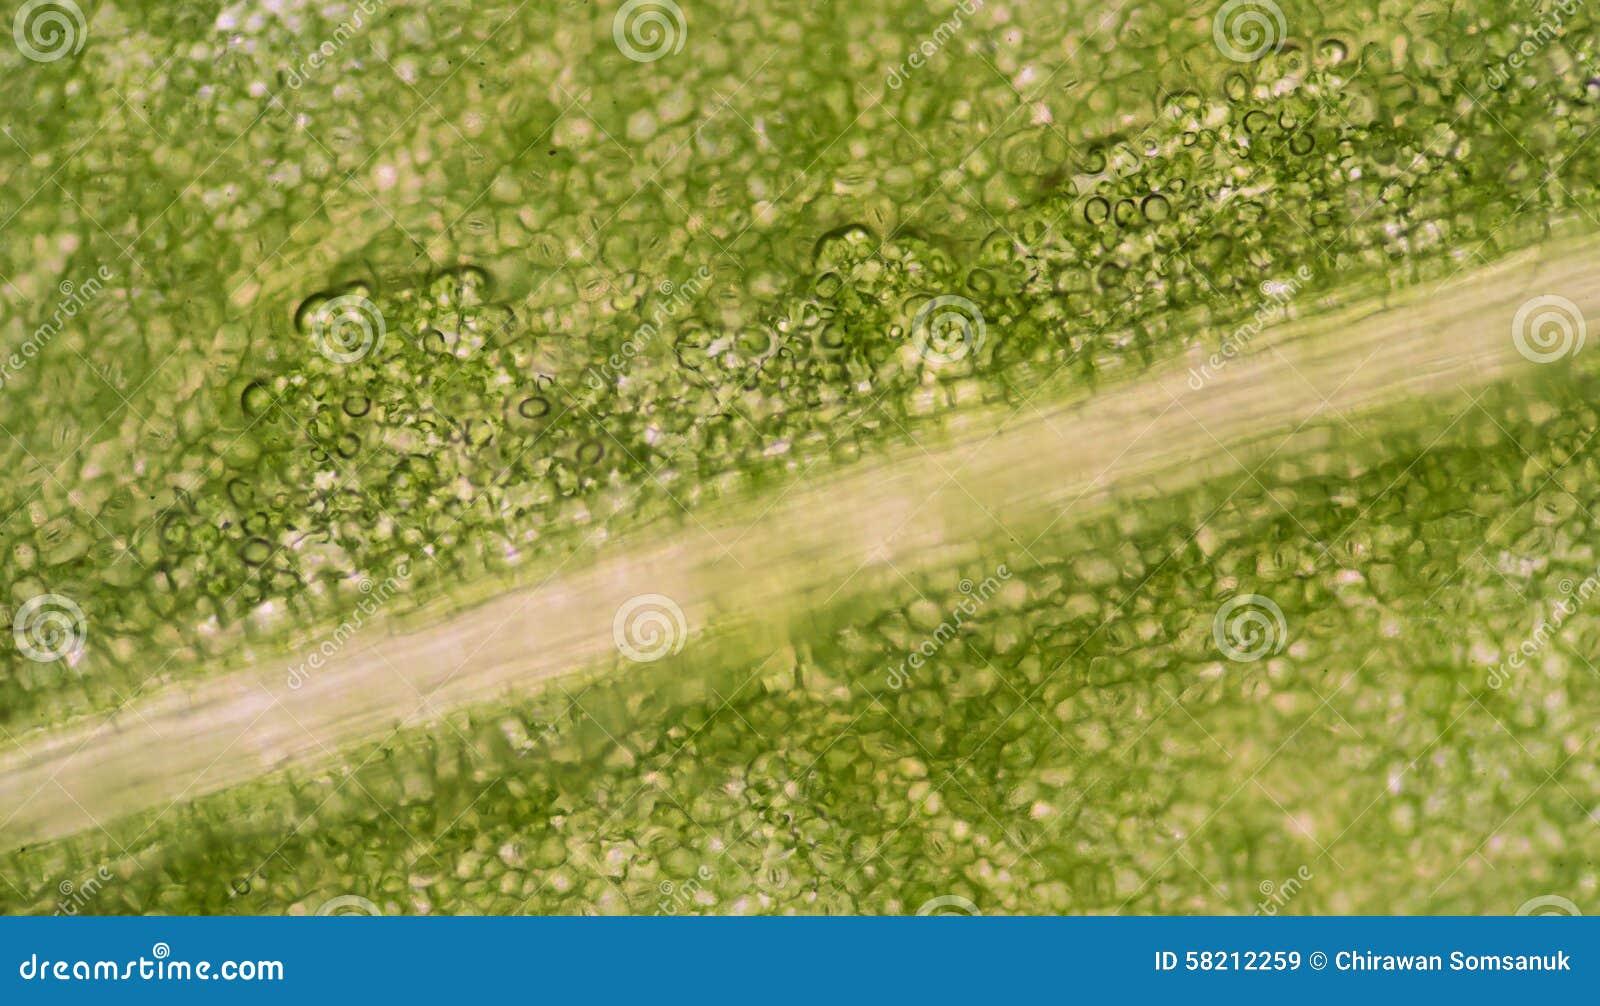 Plant Cells Under Microscope Stock Photo - Image: 58212259